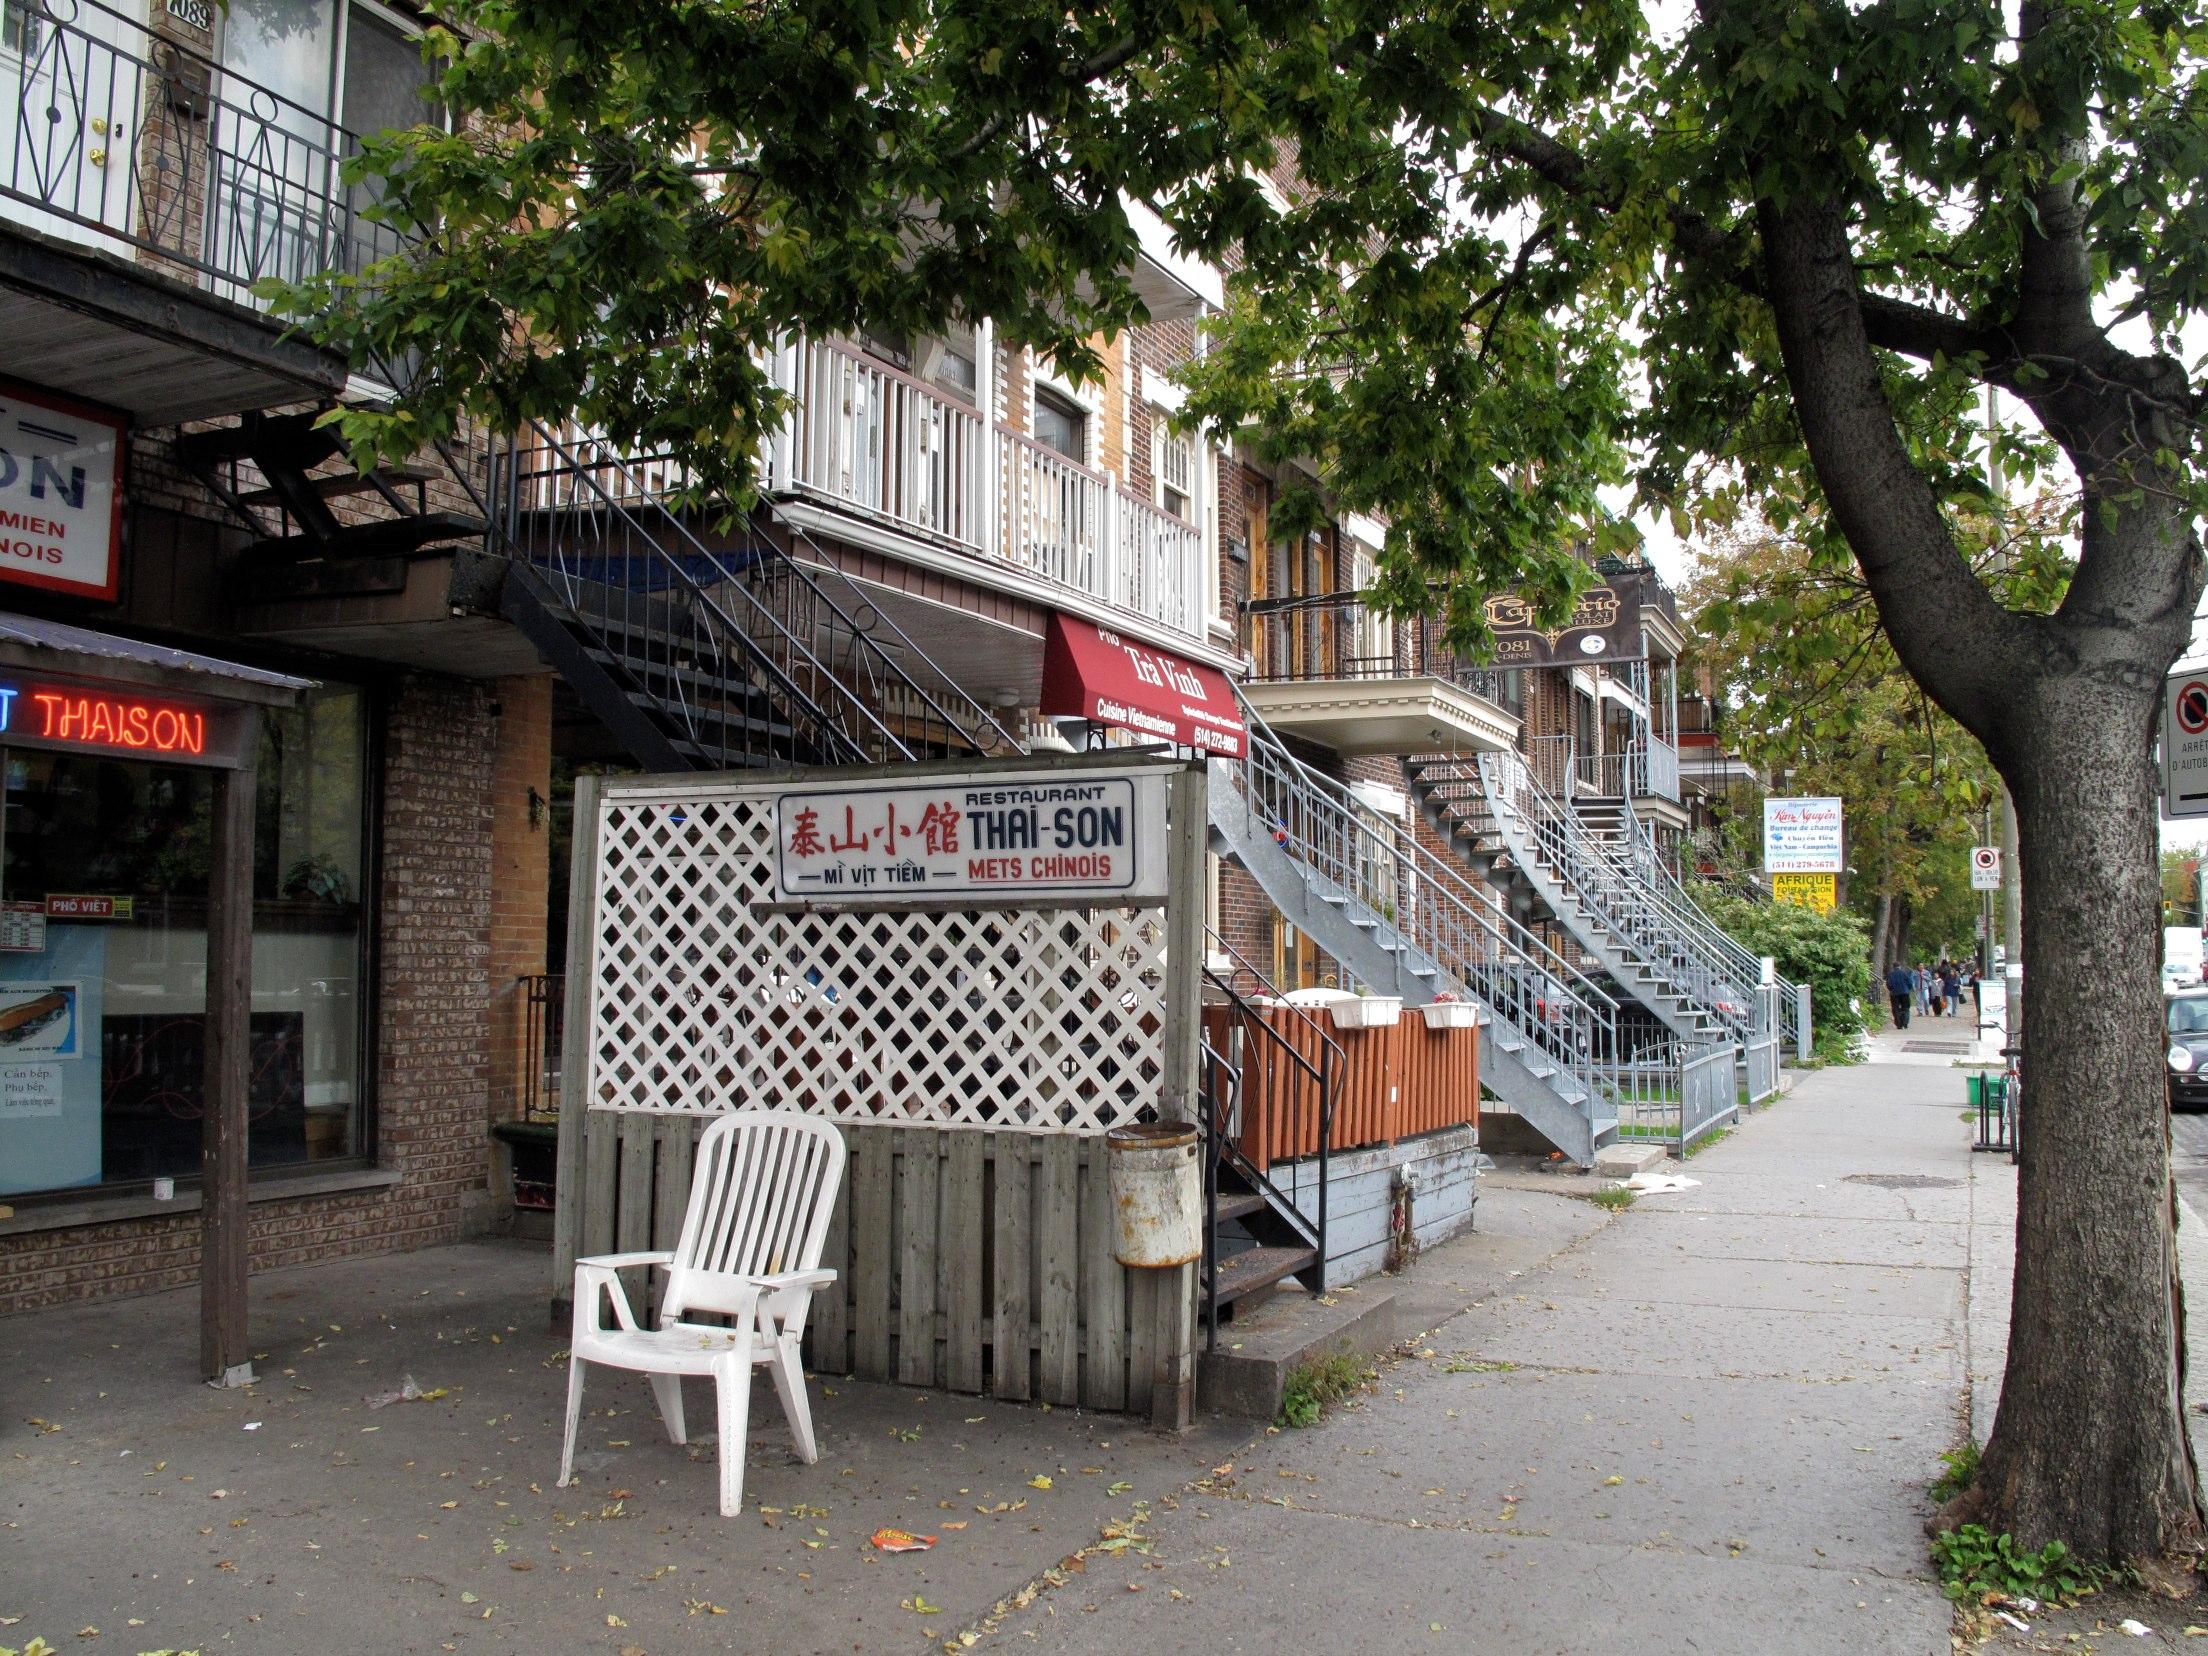 File:montréal rue st denis 362 8212690985 .jpg wikimedia commons